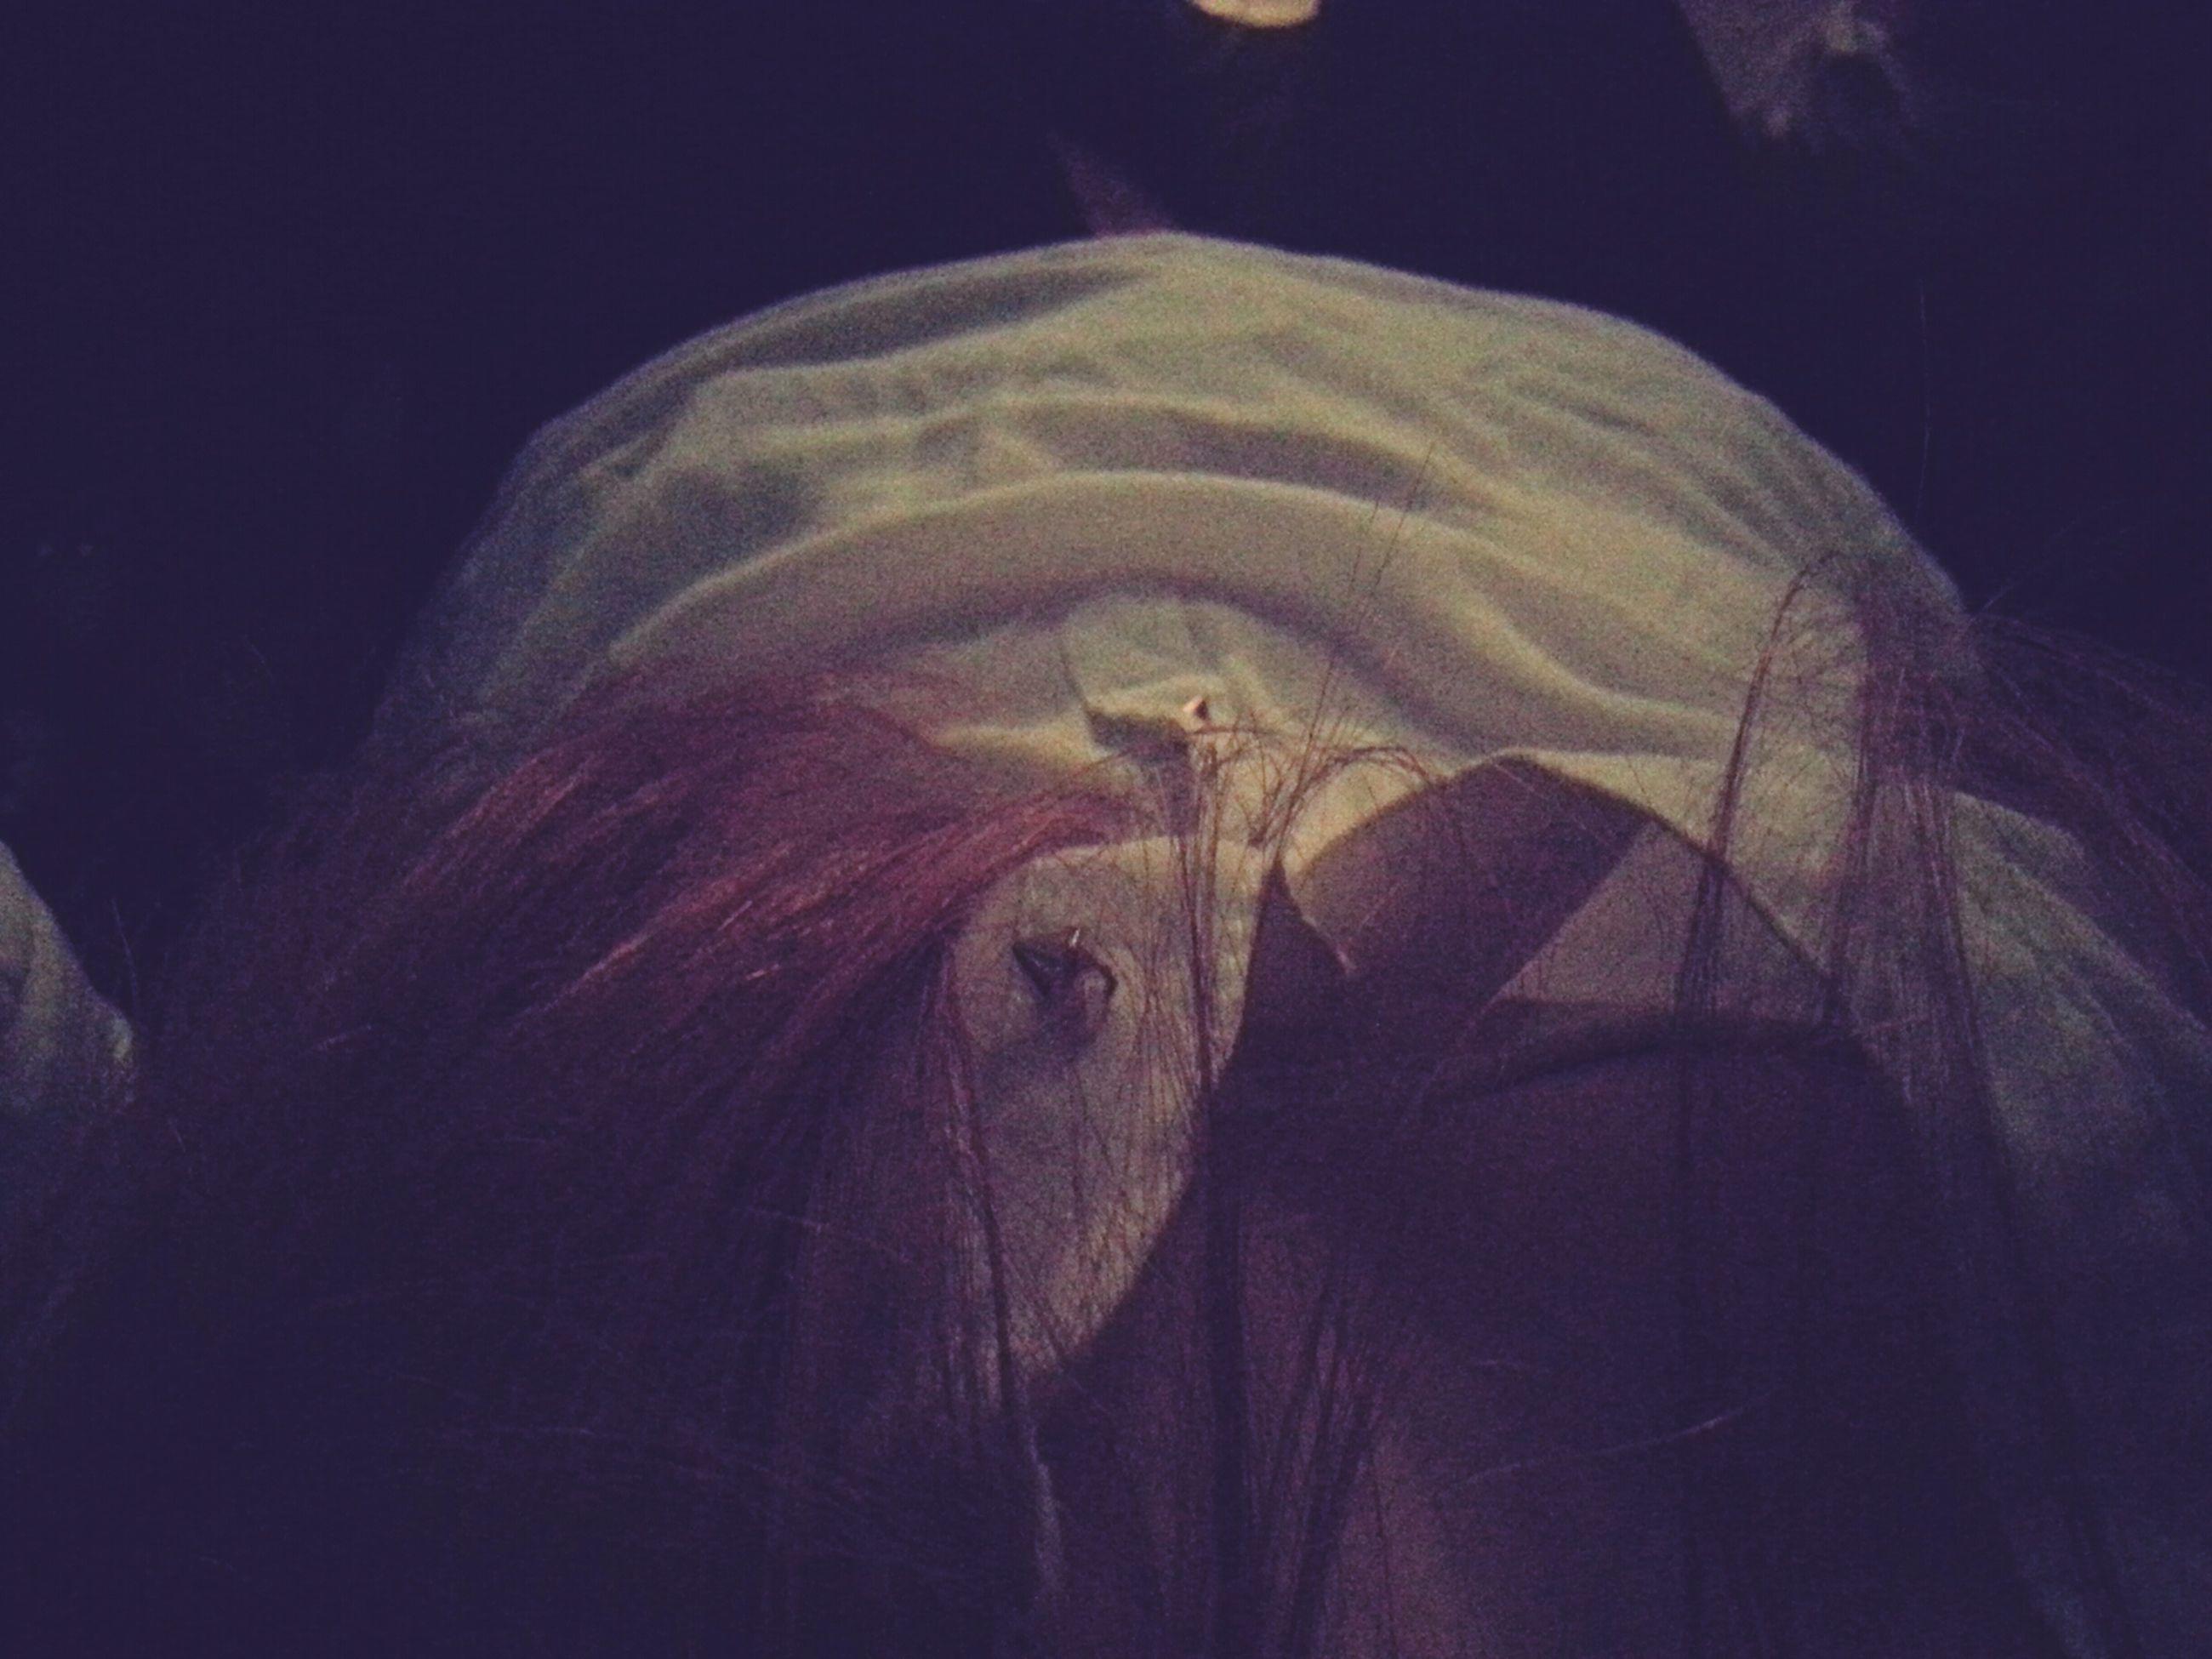 animal themes, close-up, one animal, indoors, underwater, black background, studio shot, wildlife, animals in the wild, fish, no people, night, sea life, undersea, nature, swimming, animal head, animal body part, horse, animal representation